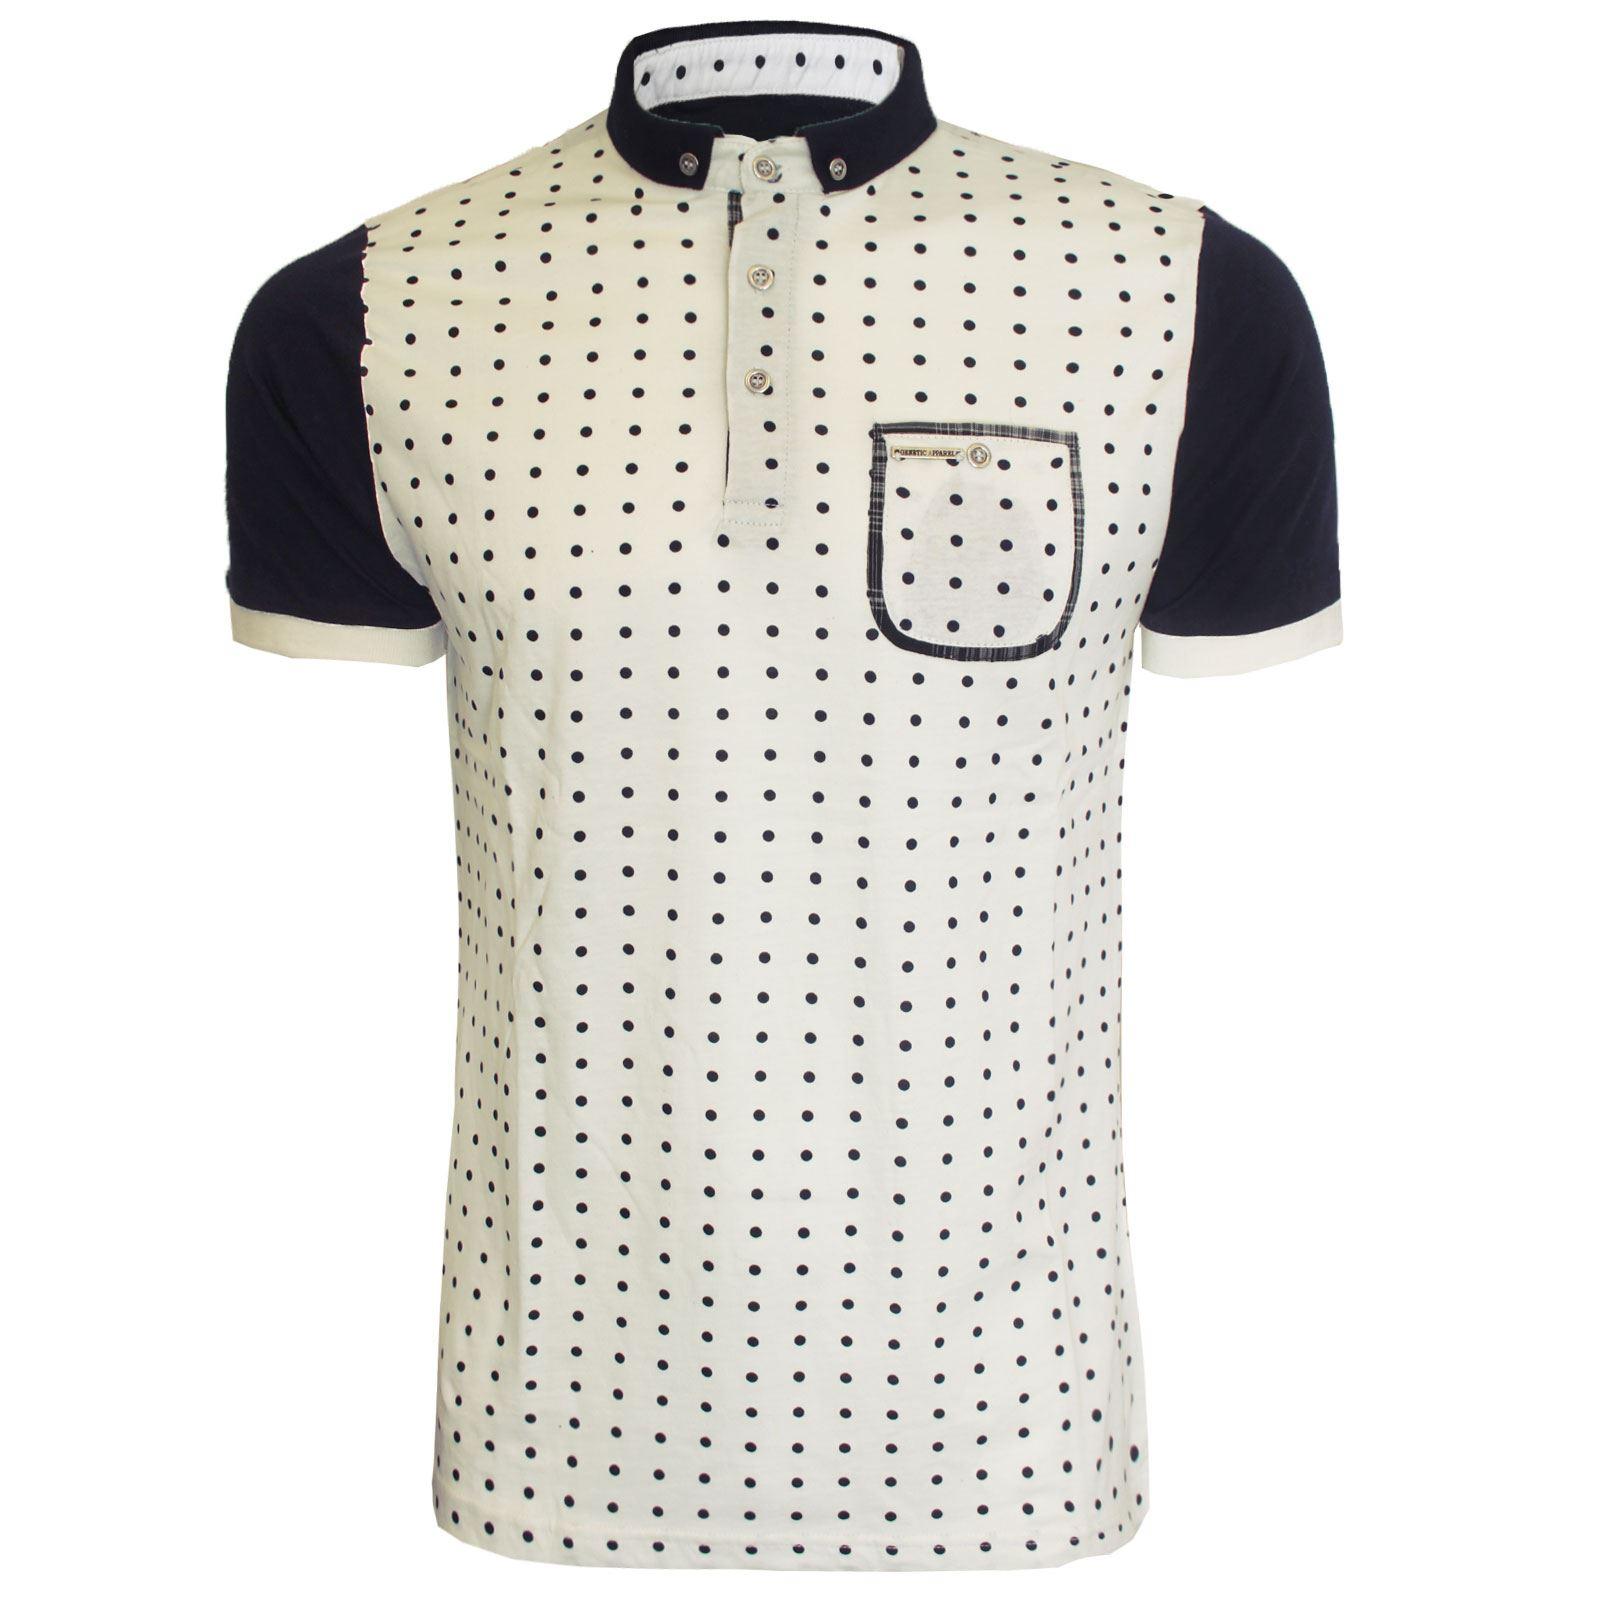 Shirt design style - New Mens Polka Design Style Short Sleeve Collar